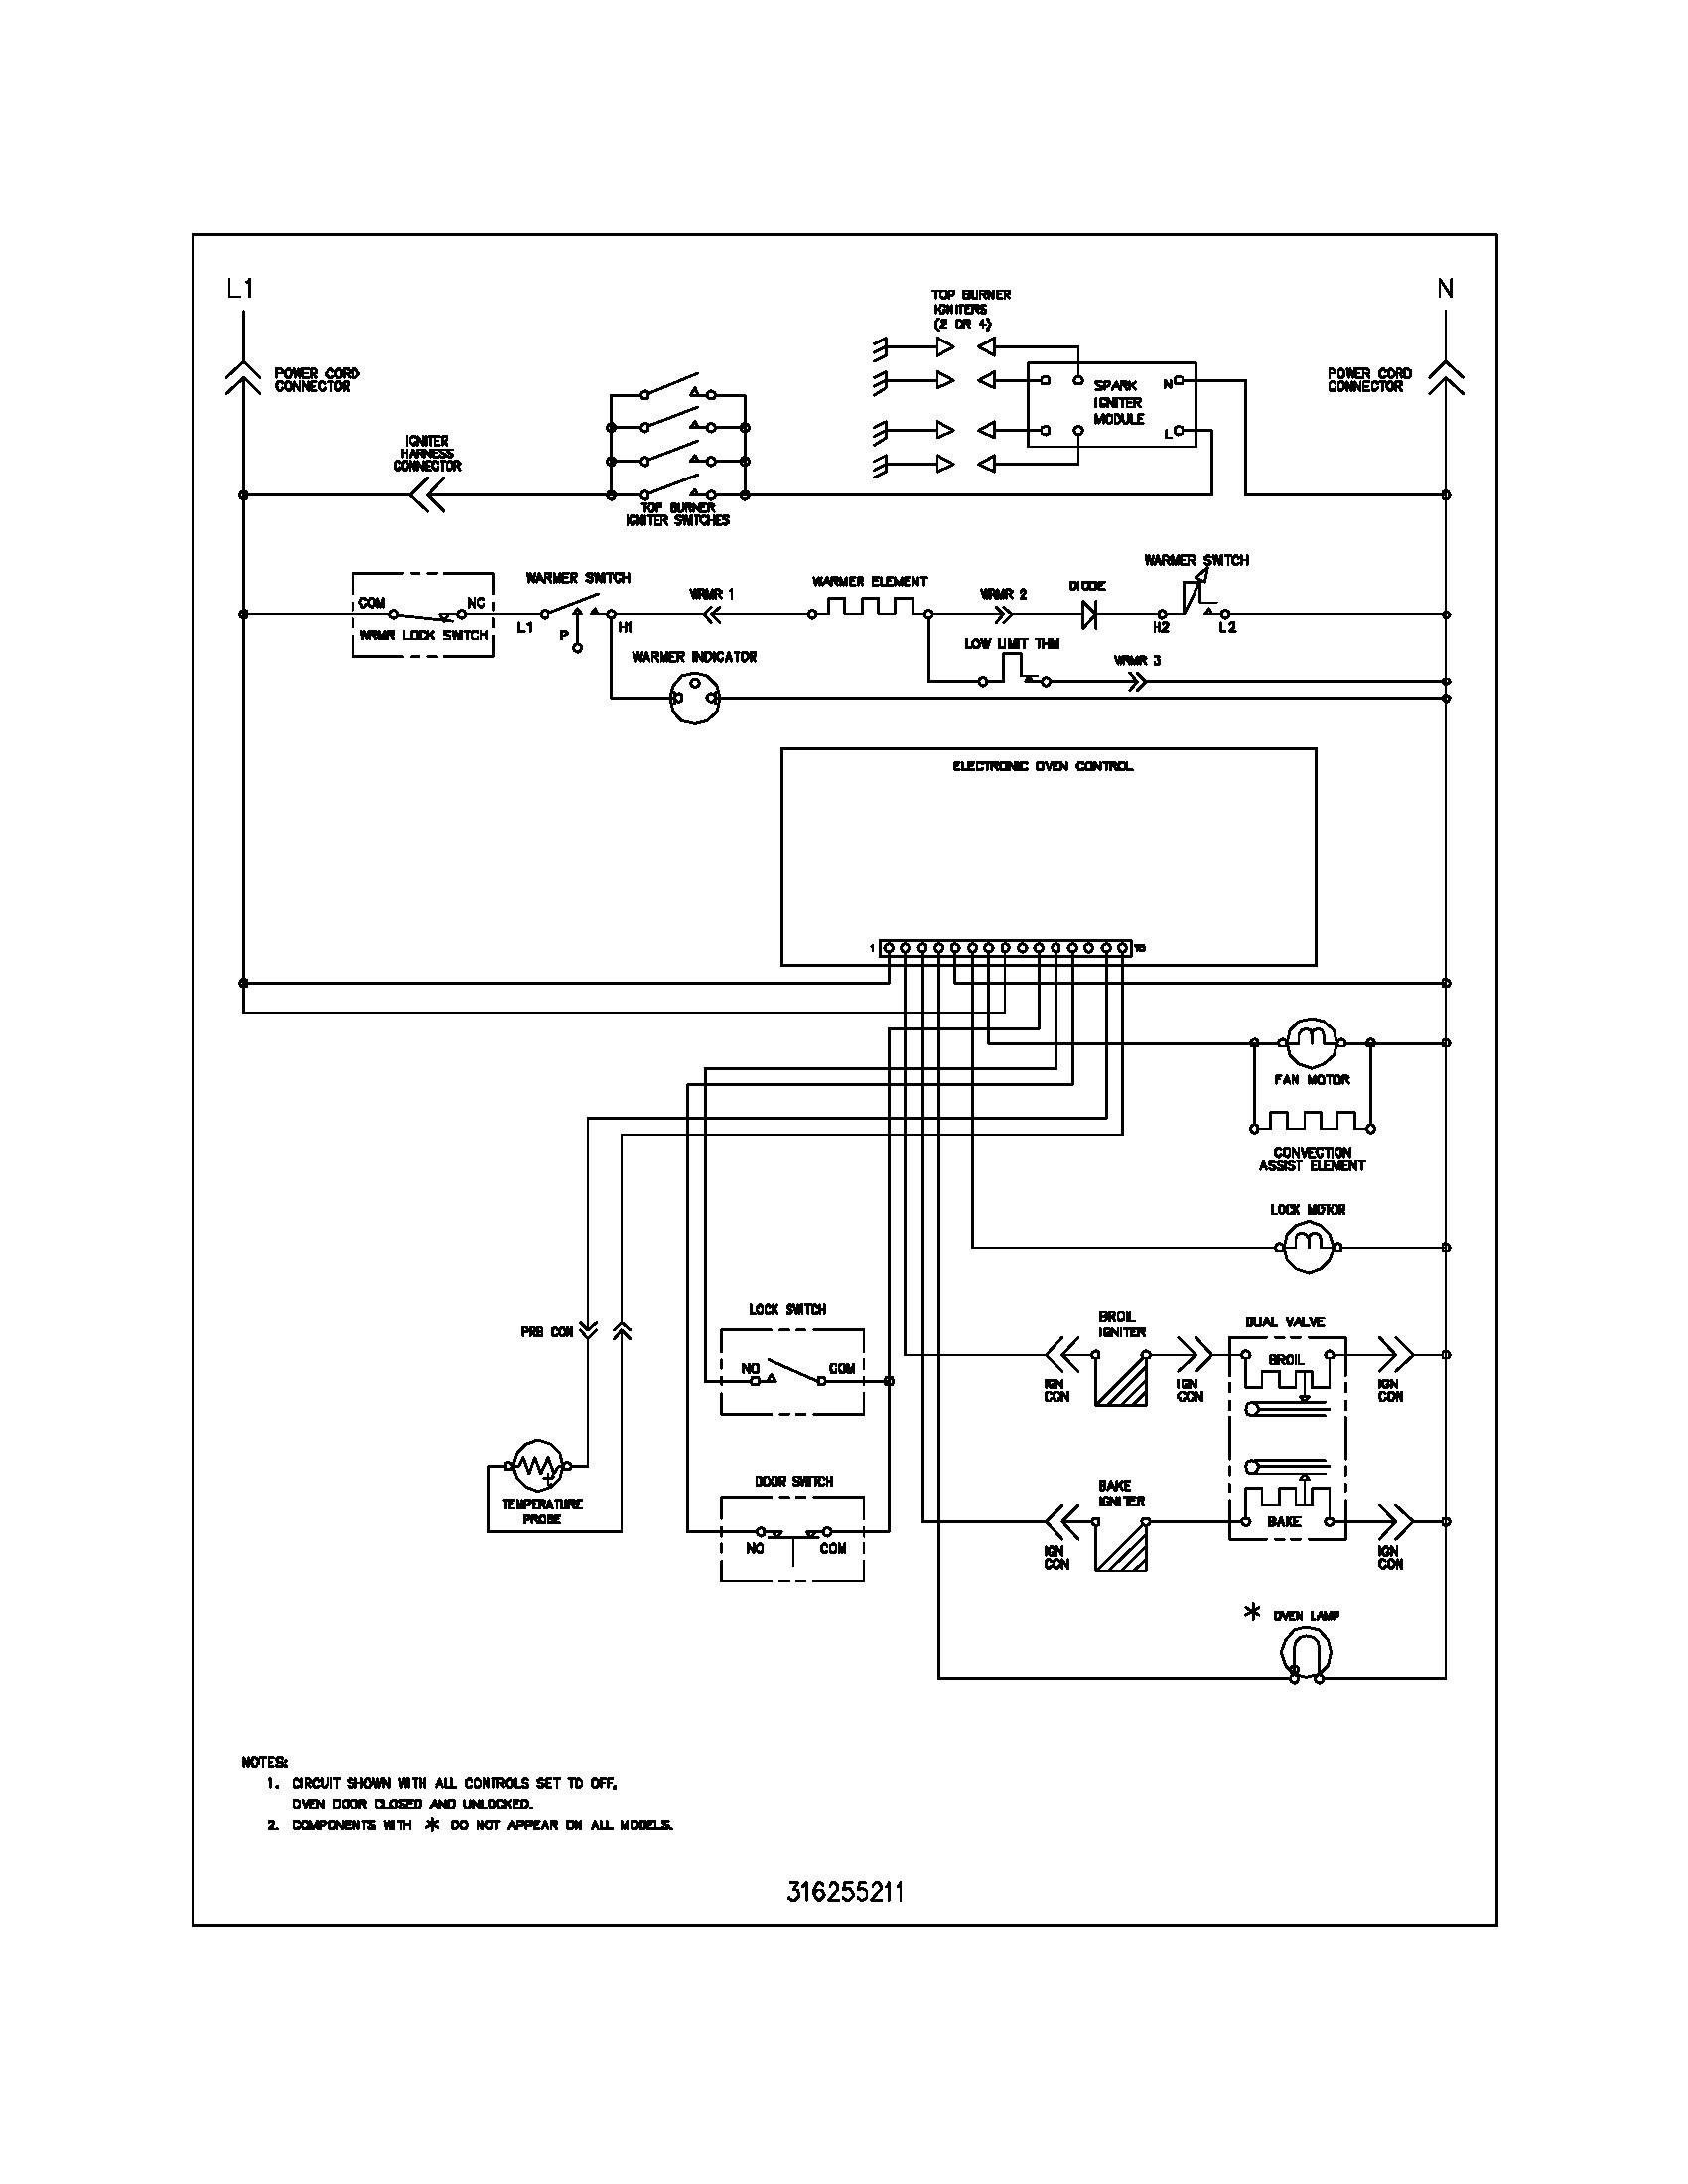 Goodman Electric Furnace Wiring Diagram Copy Wiring Diagram For - Coleman Electric Furnace Wiring Diagram